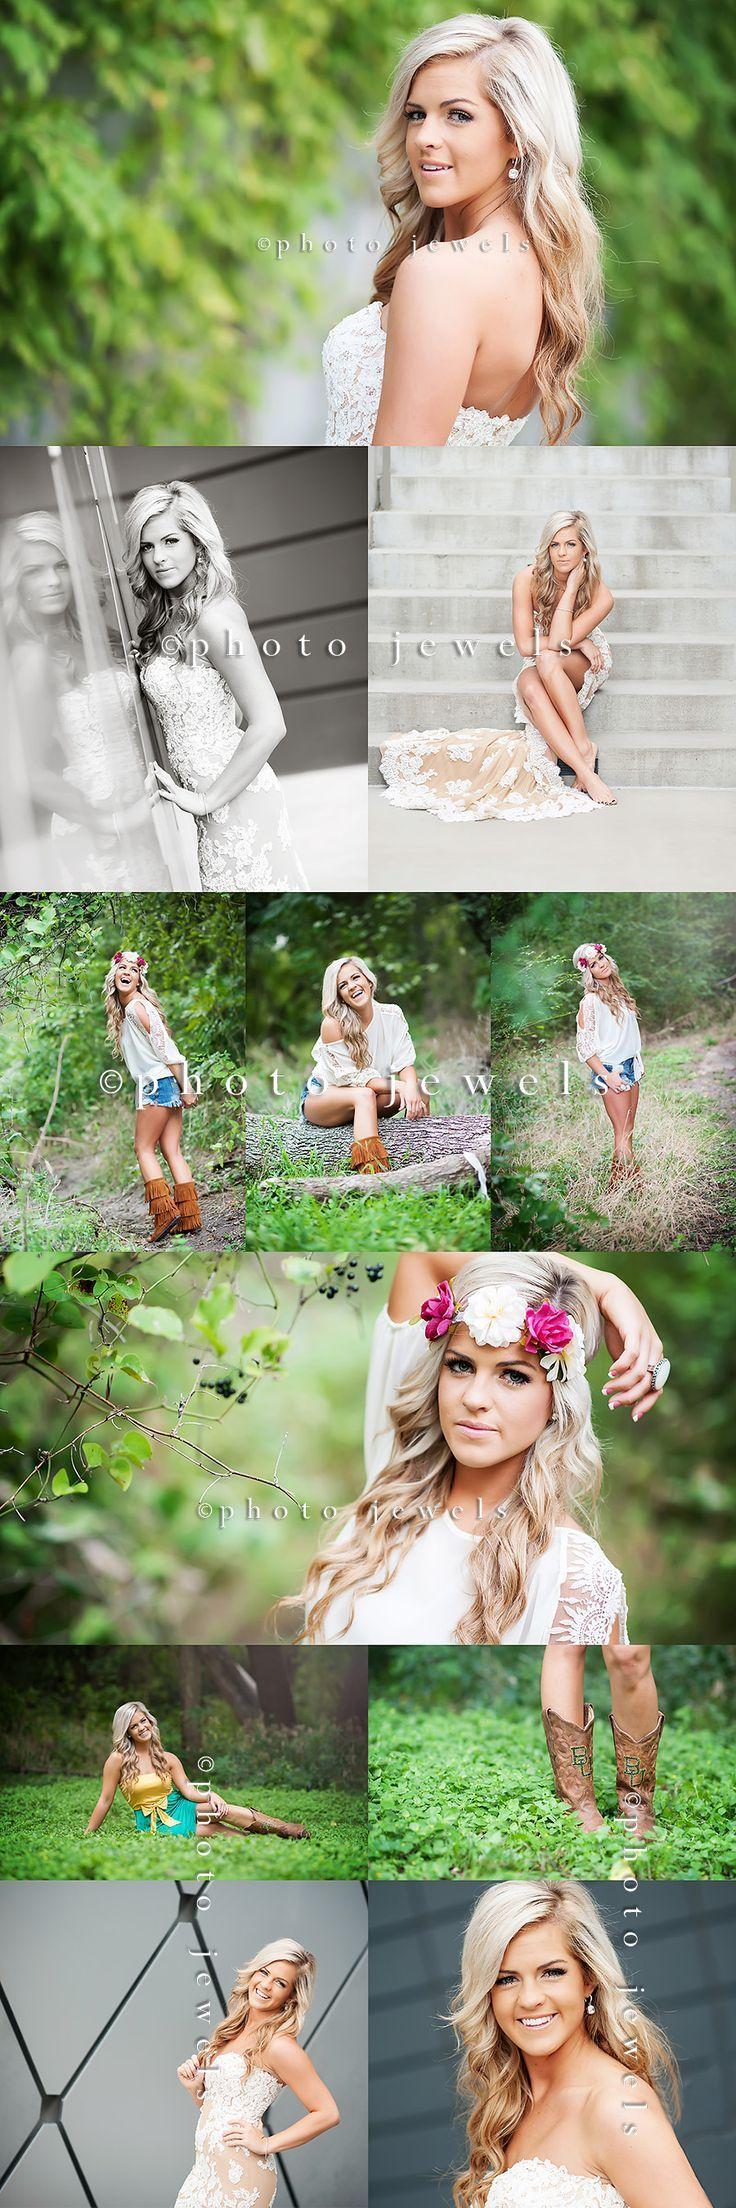 Madeline, Senior 2014  senior photographer rockwall  Photo Jewels get free on http://freefacebookcovers.net: